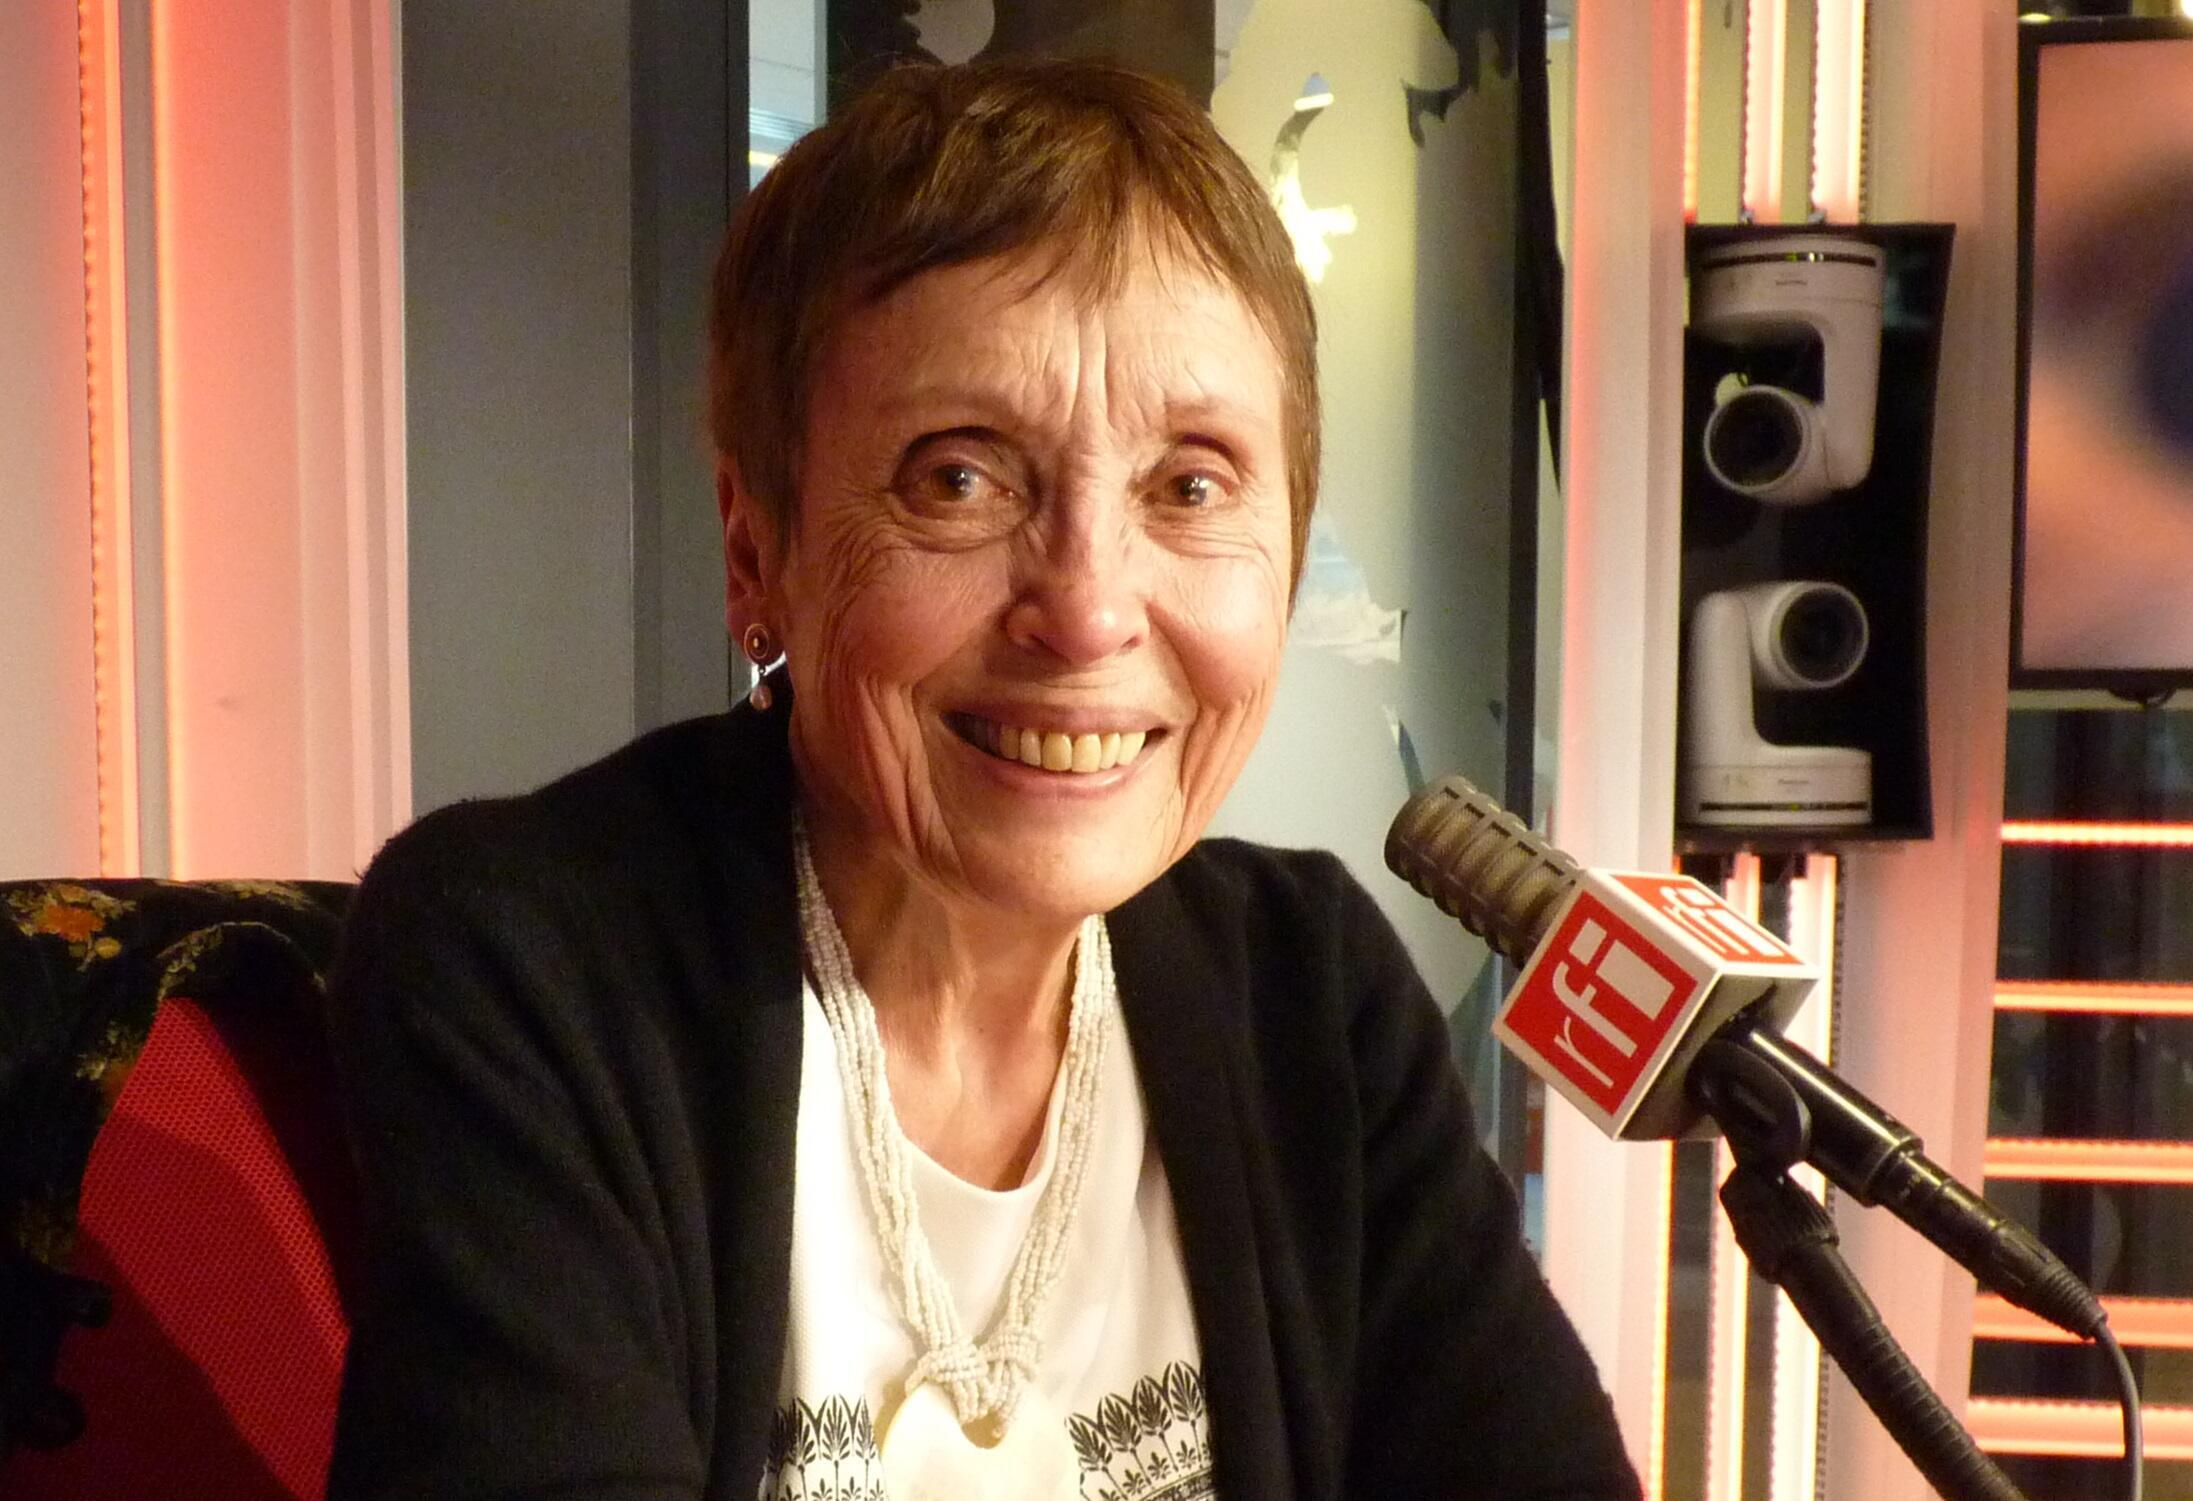 La antropóloga francesa Carmen Bernand en RFI